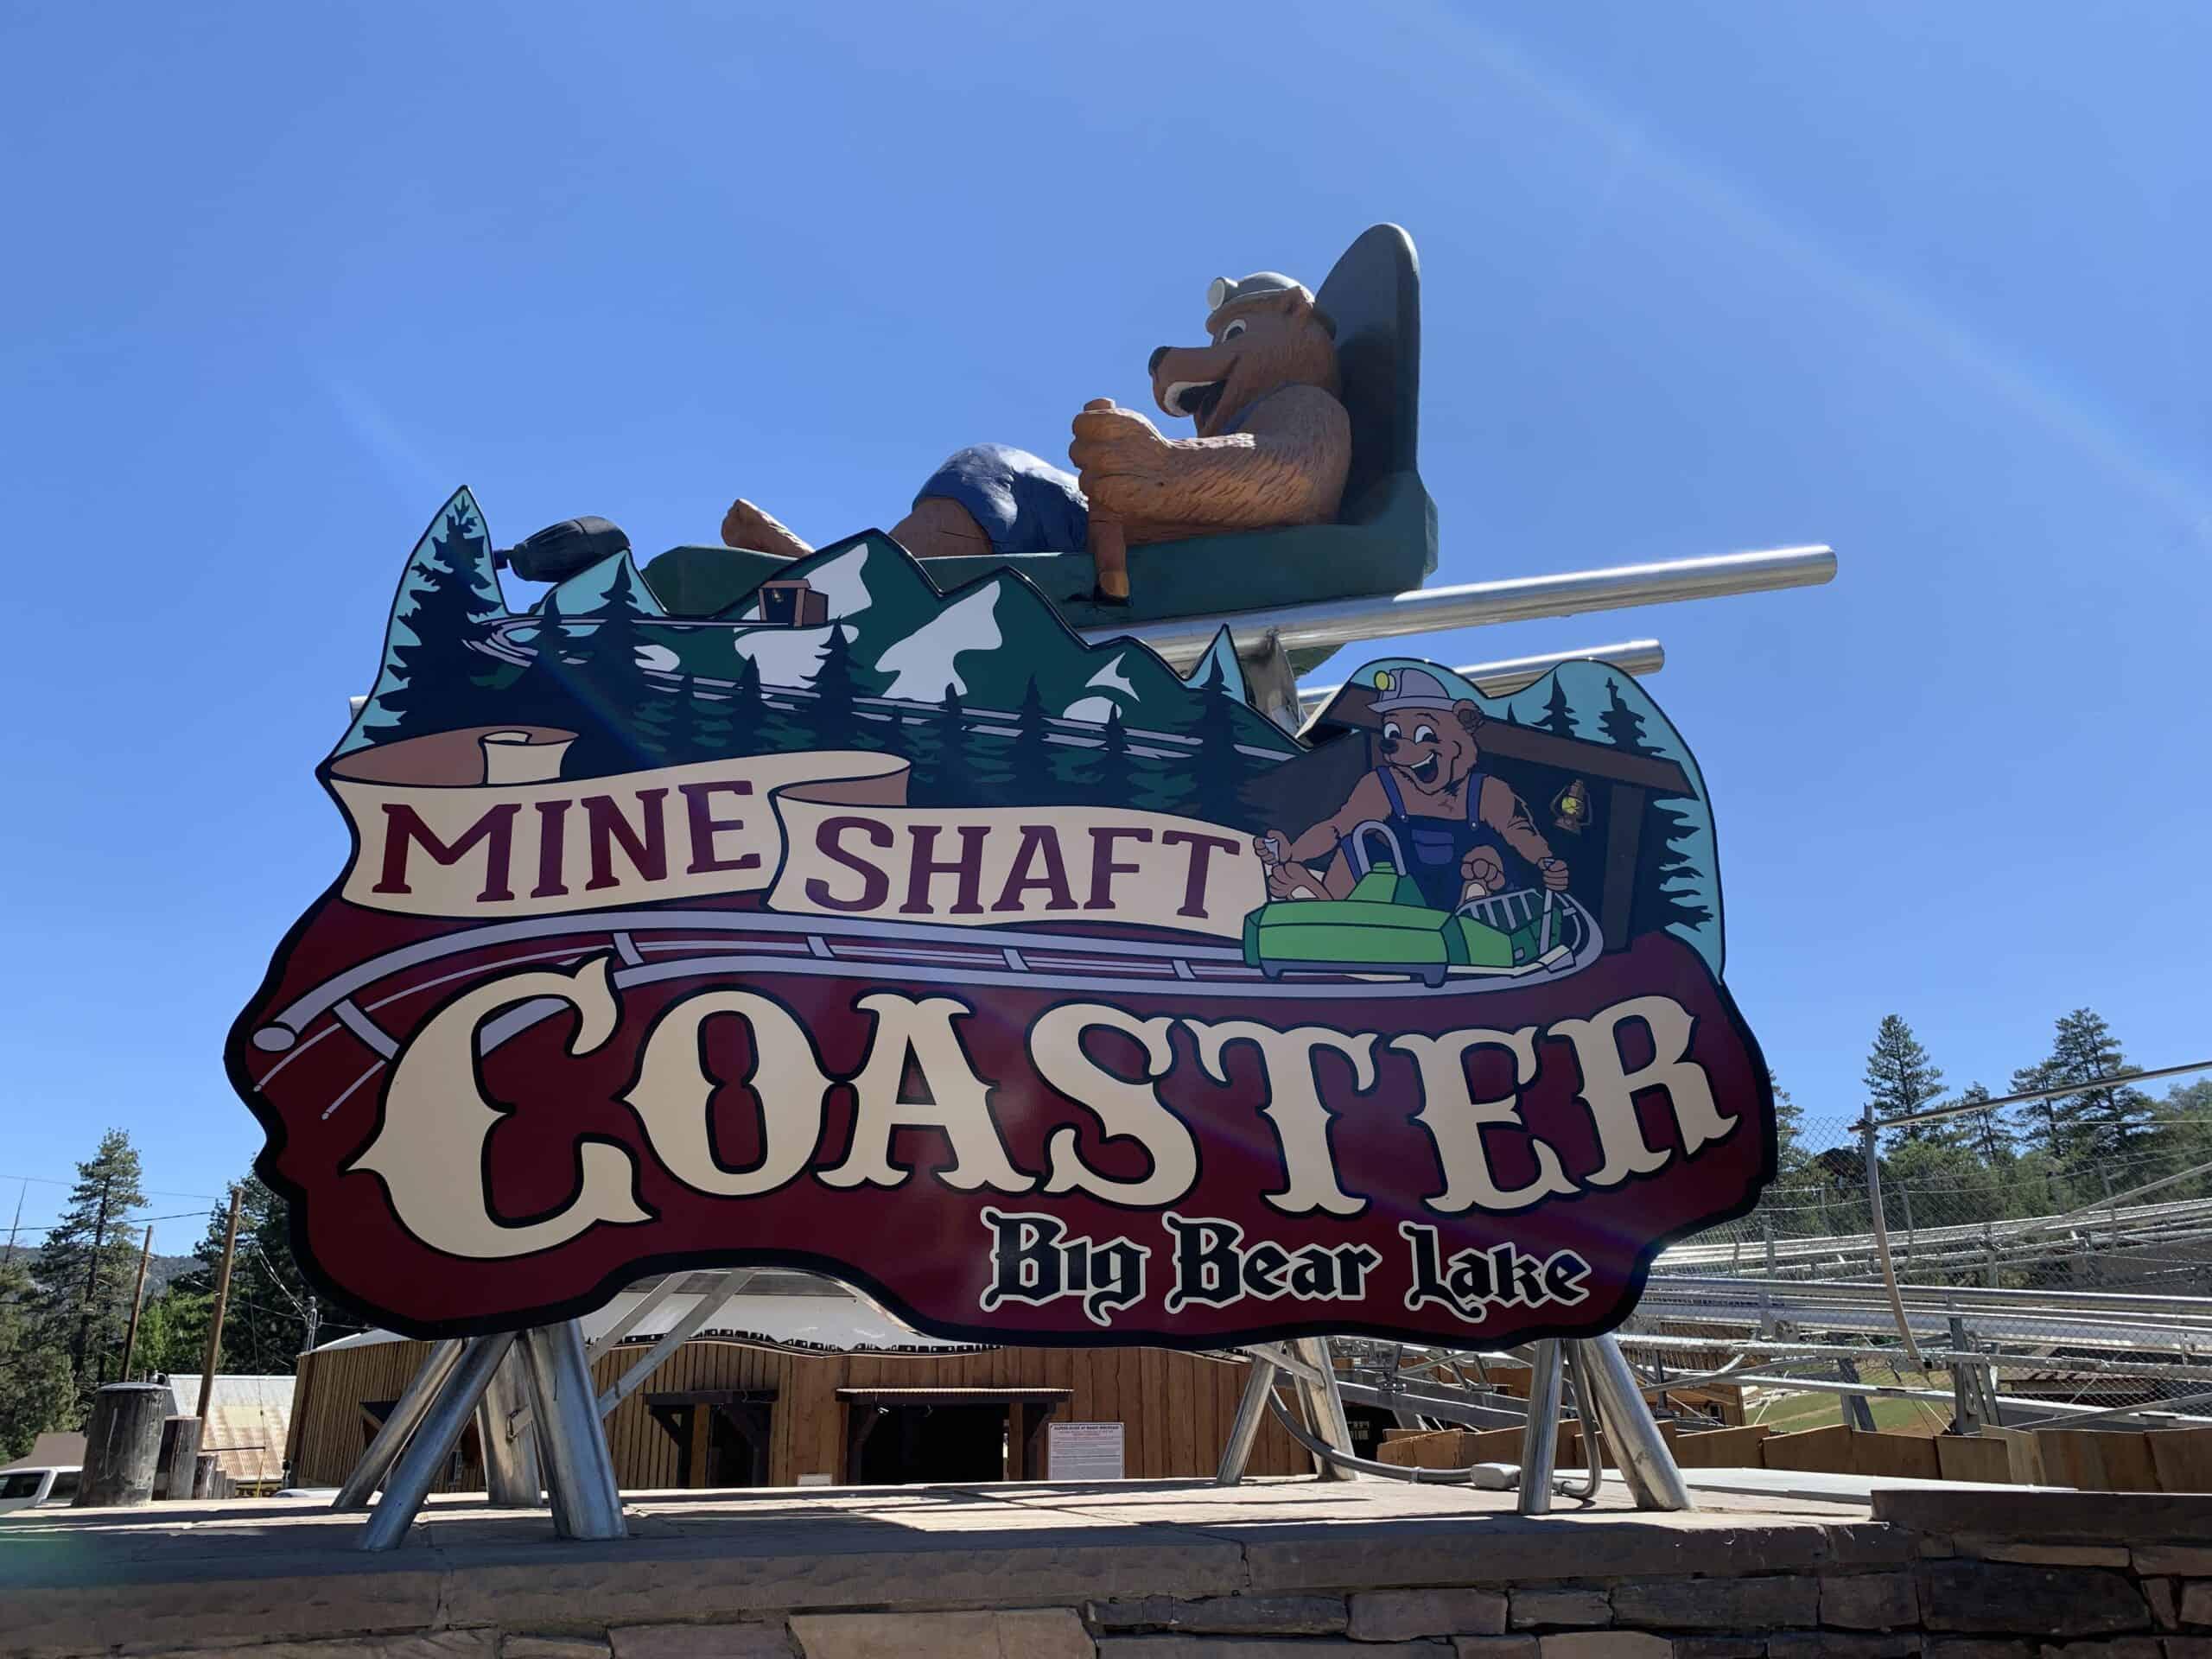 New Mineshaft Coaster In Big Bear